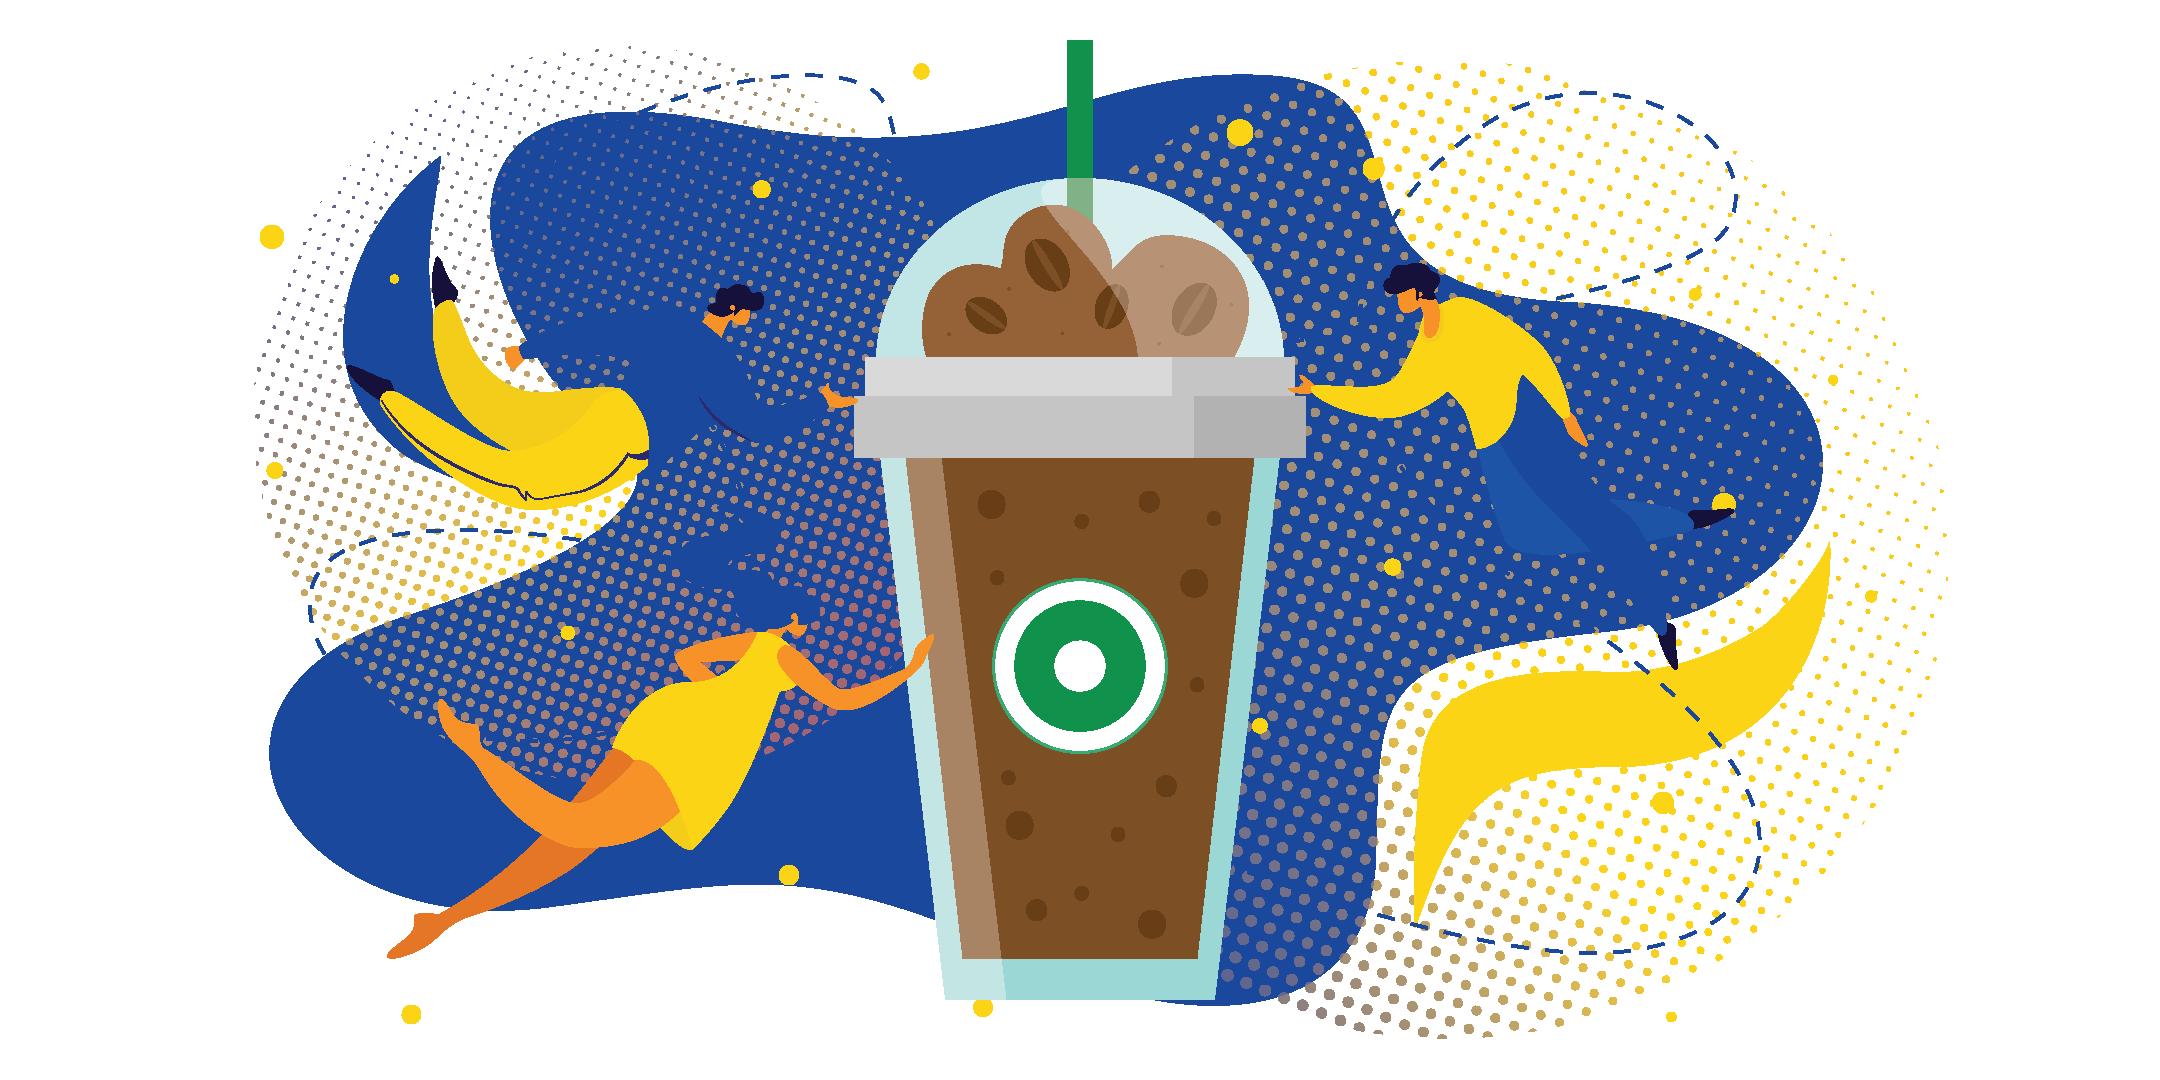 Useful-Insights-From-Starbucks-Successful-Loyalty-Program